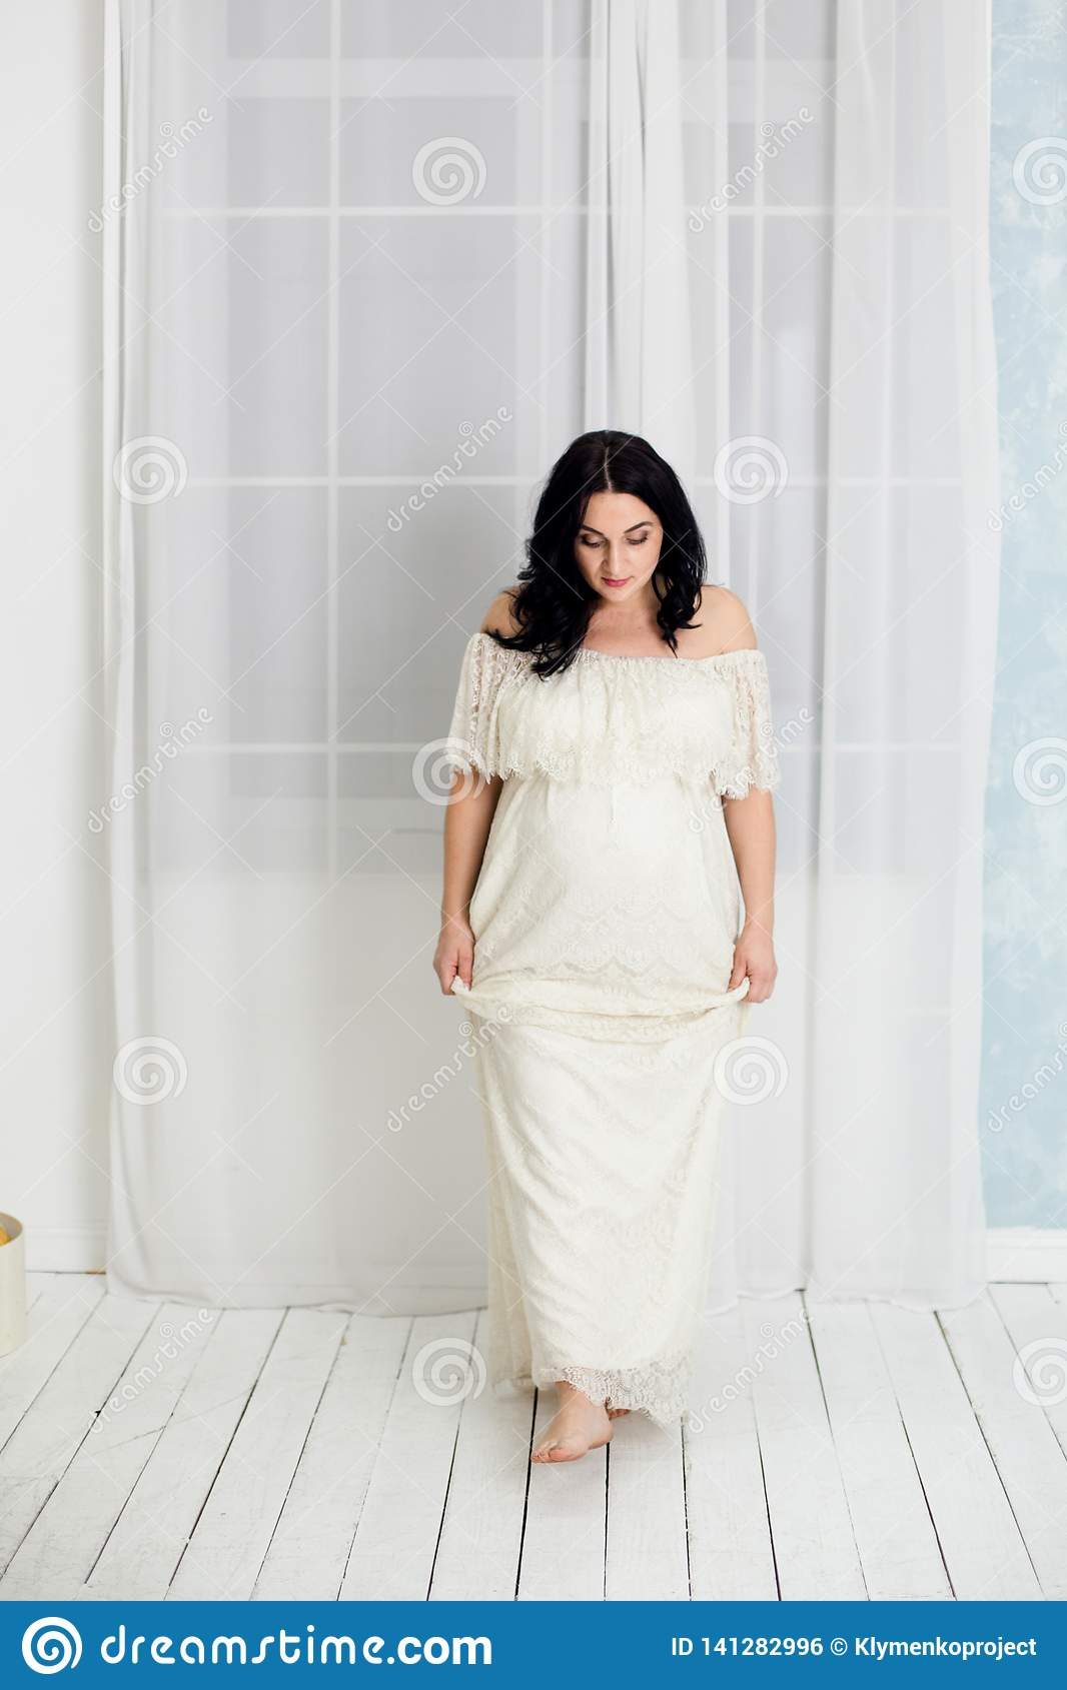 Fashion portrait of happy pregnant woman in white dress